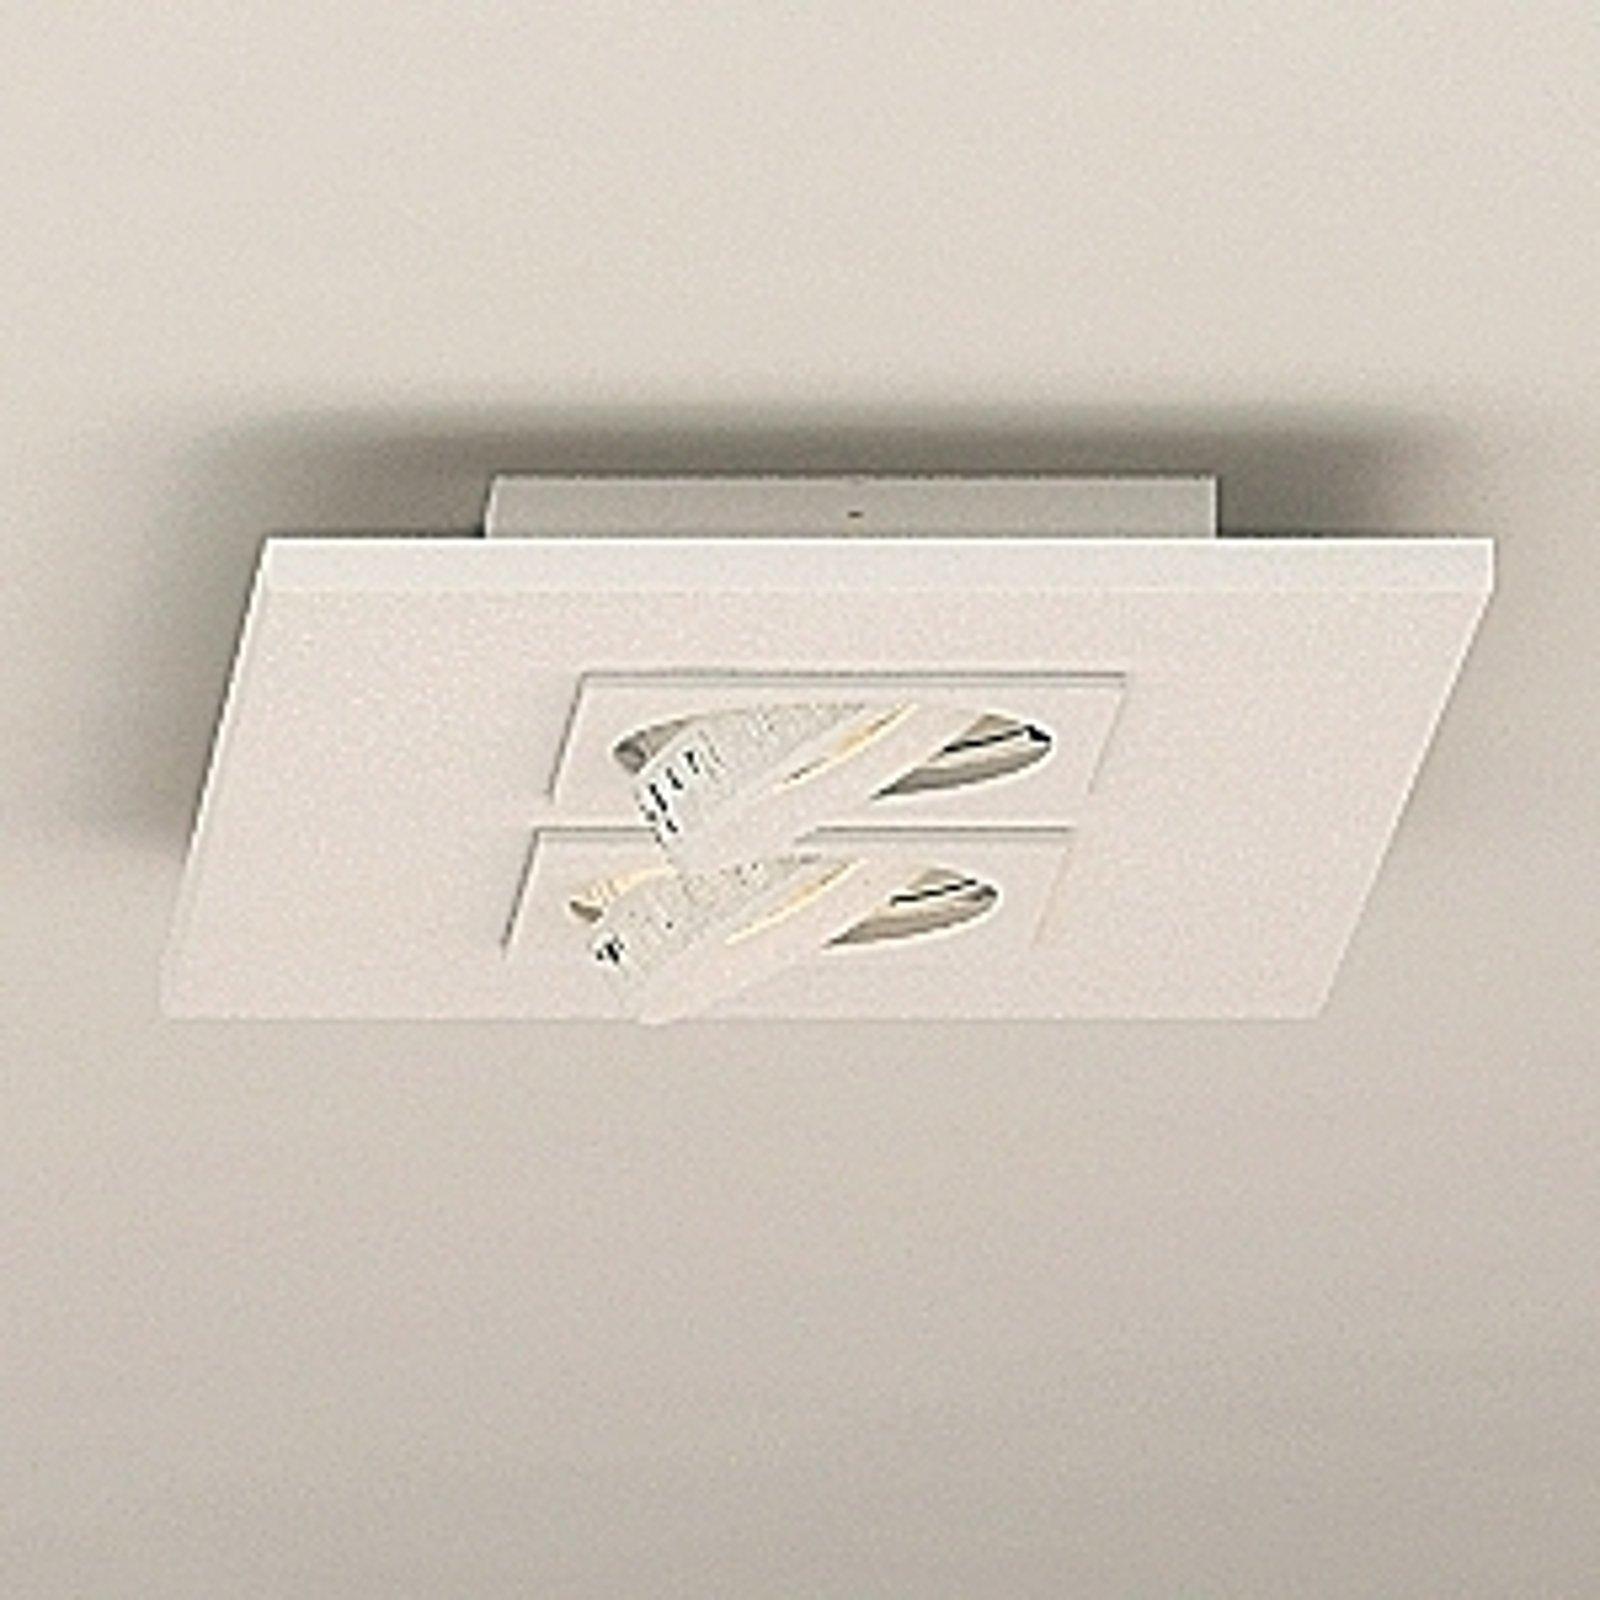 Milan Marc - LED-taklampe, 2 lyskilder, dreibar